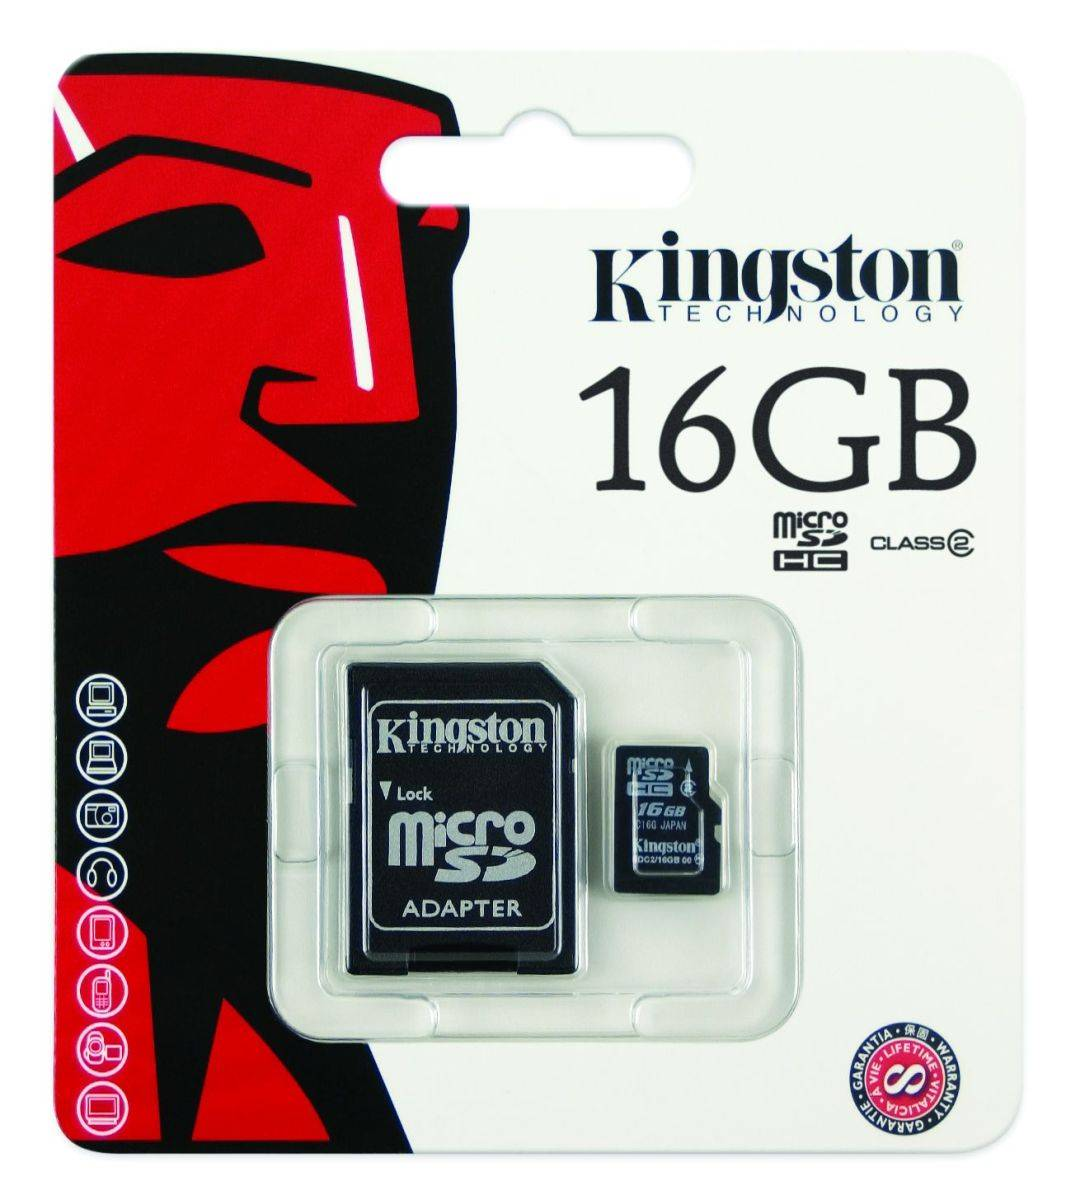 KINGSTONE MICRO SD 16GB